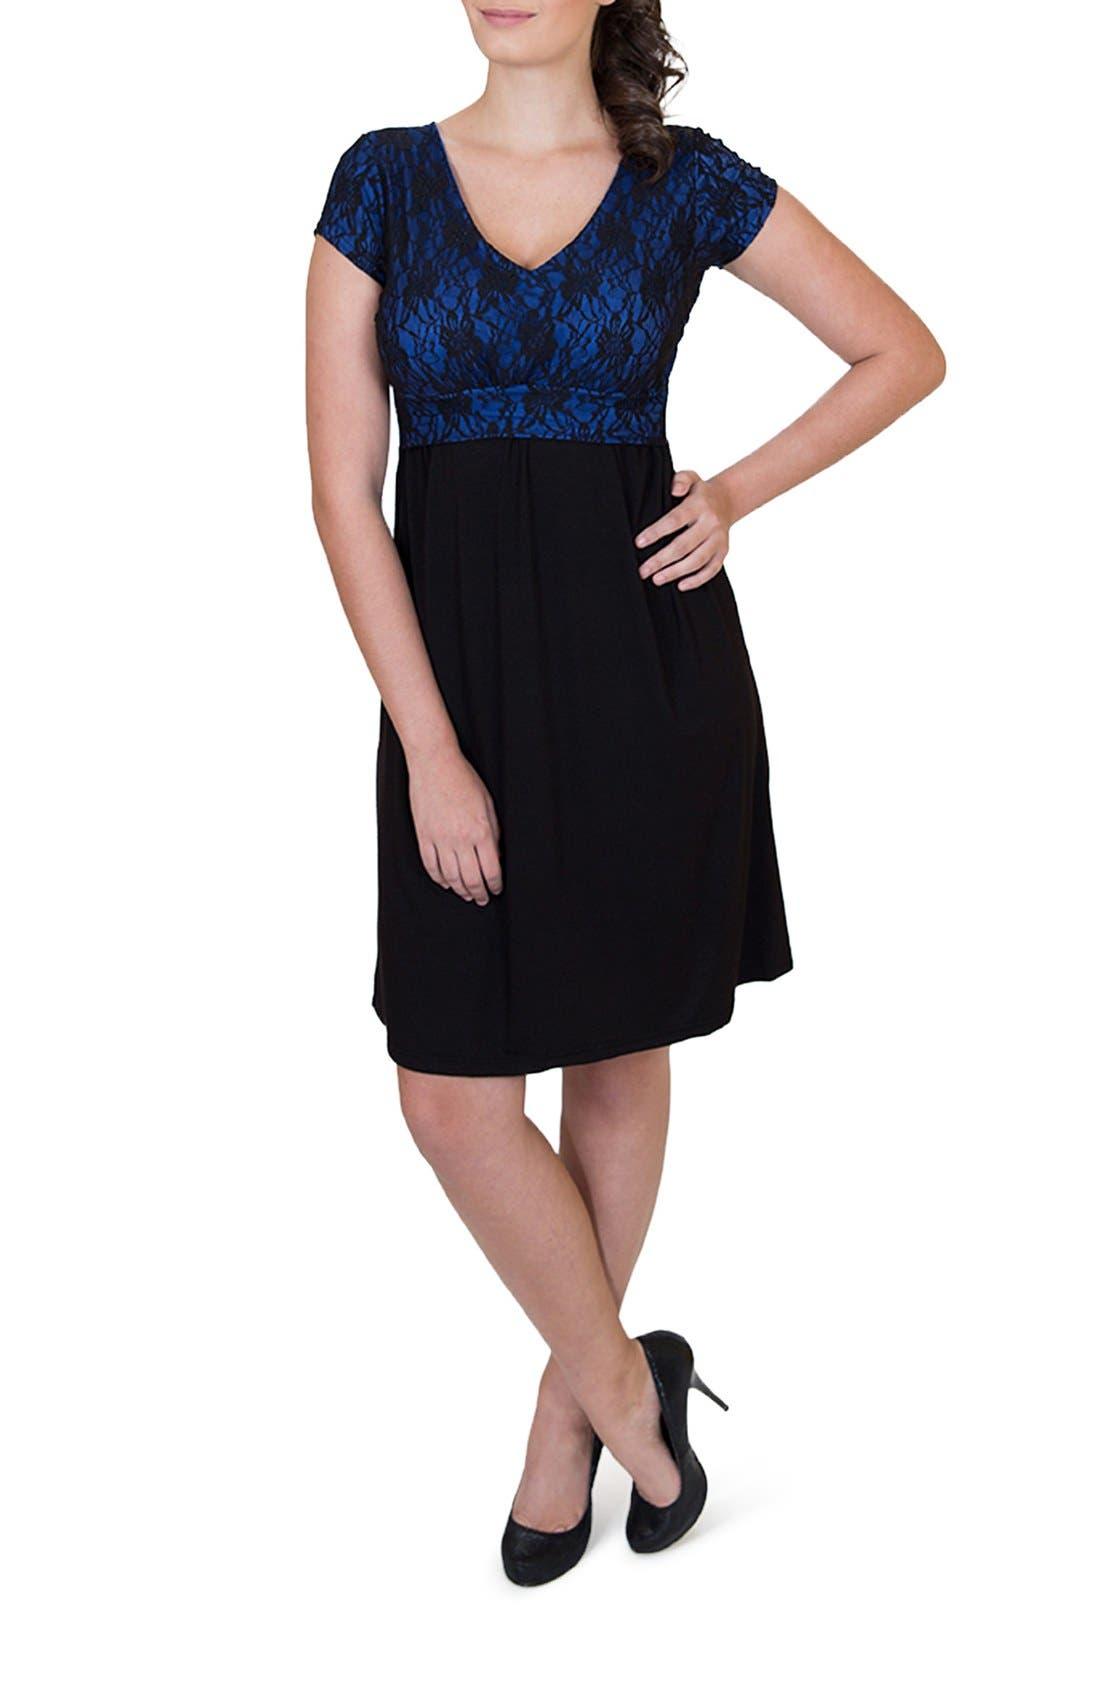 'Camila' Maternity/Nursing Dress,                             Main thumbnail 1, color,                             ROYAL BLUE/ BLACK